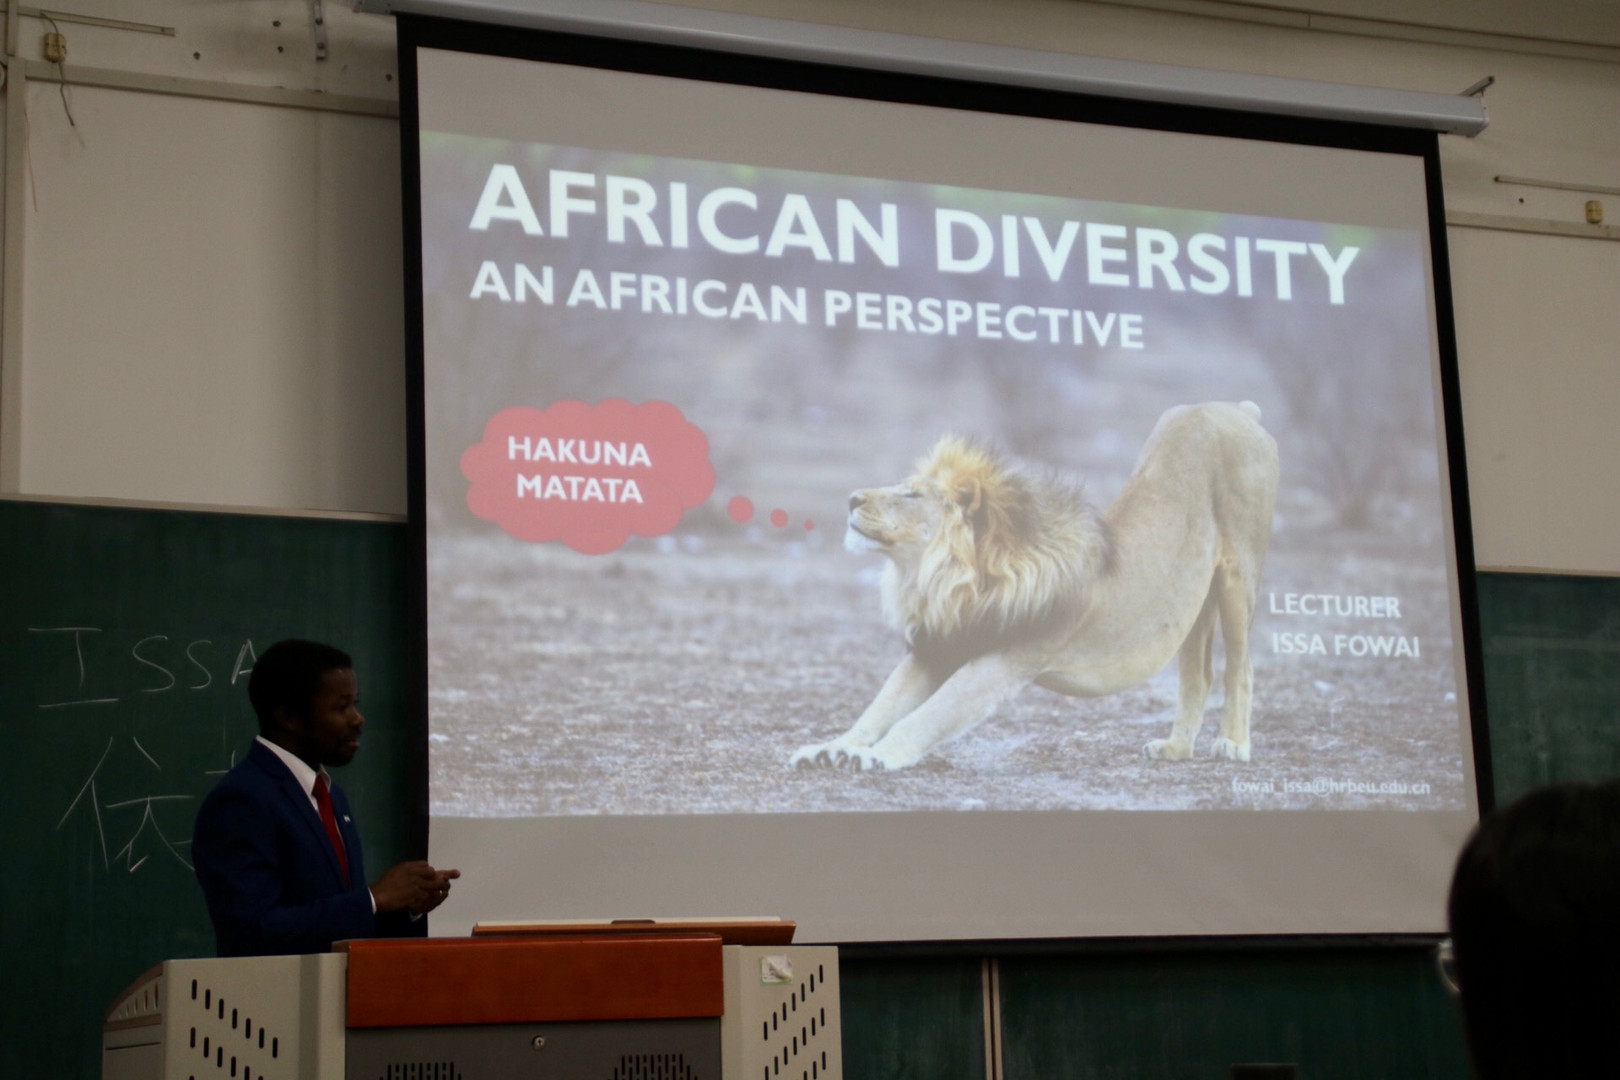 African Diversity